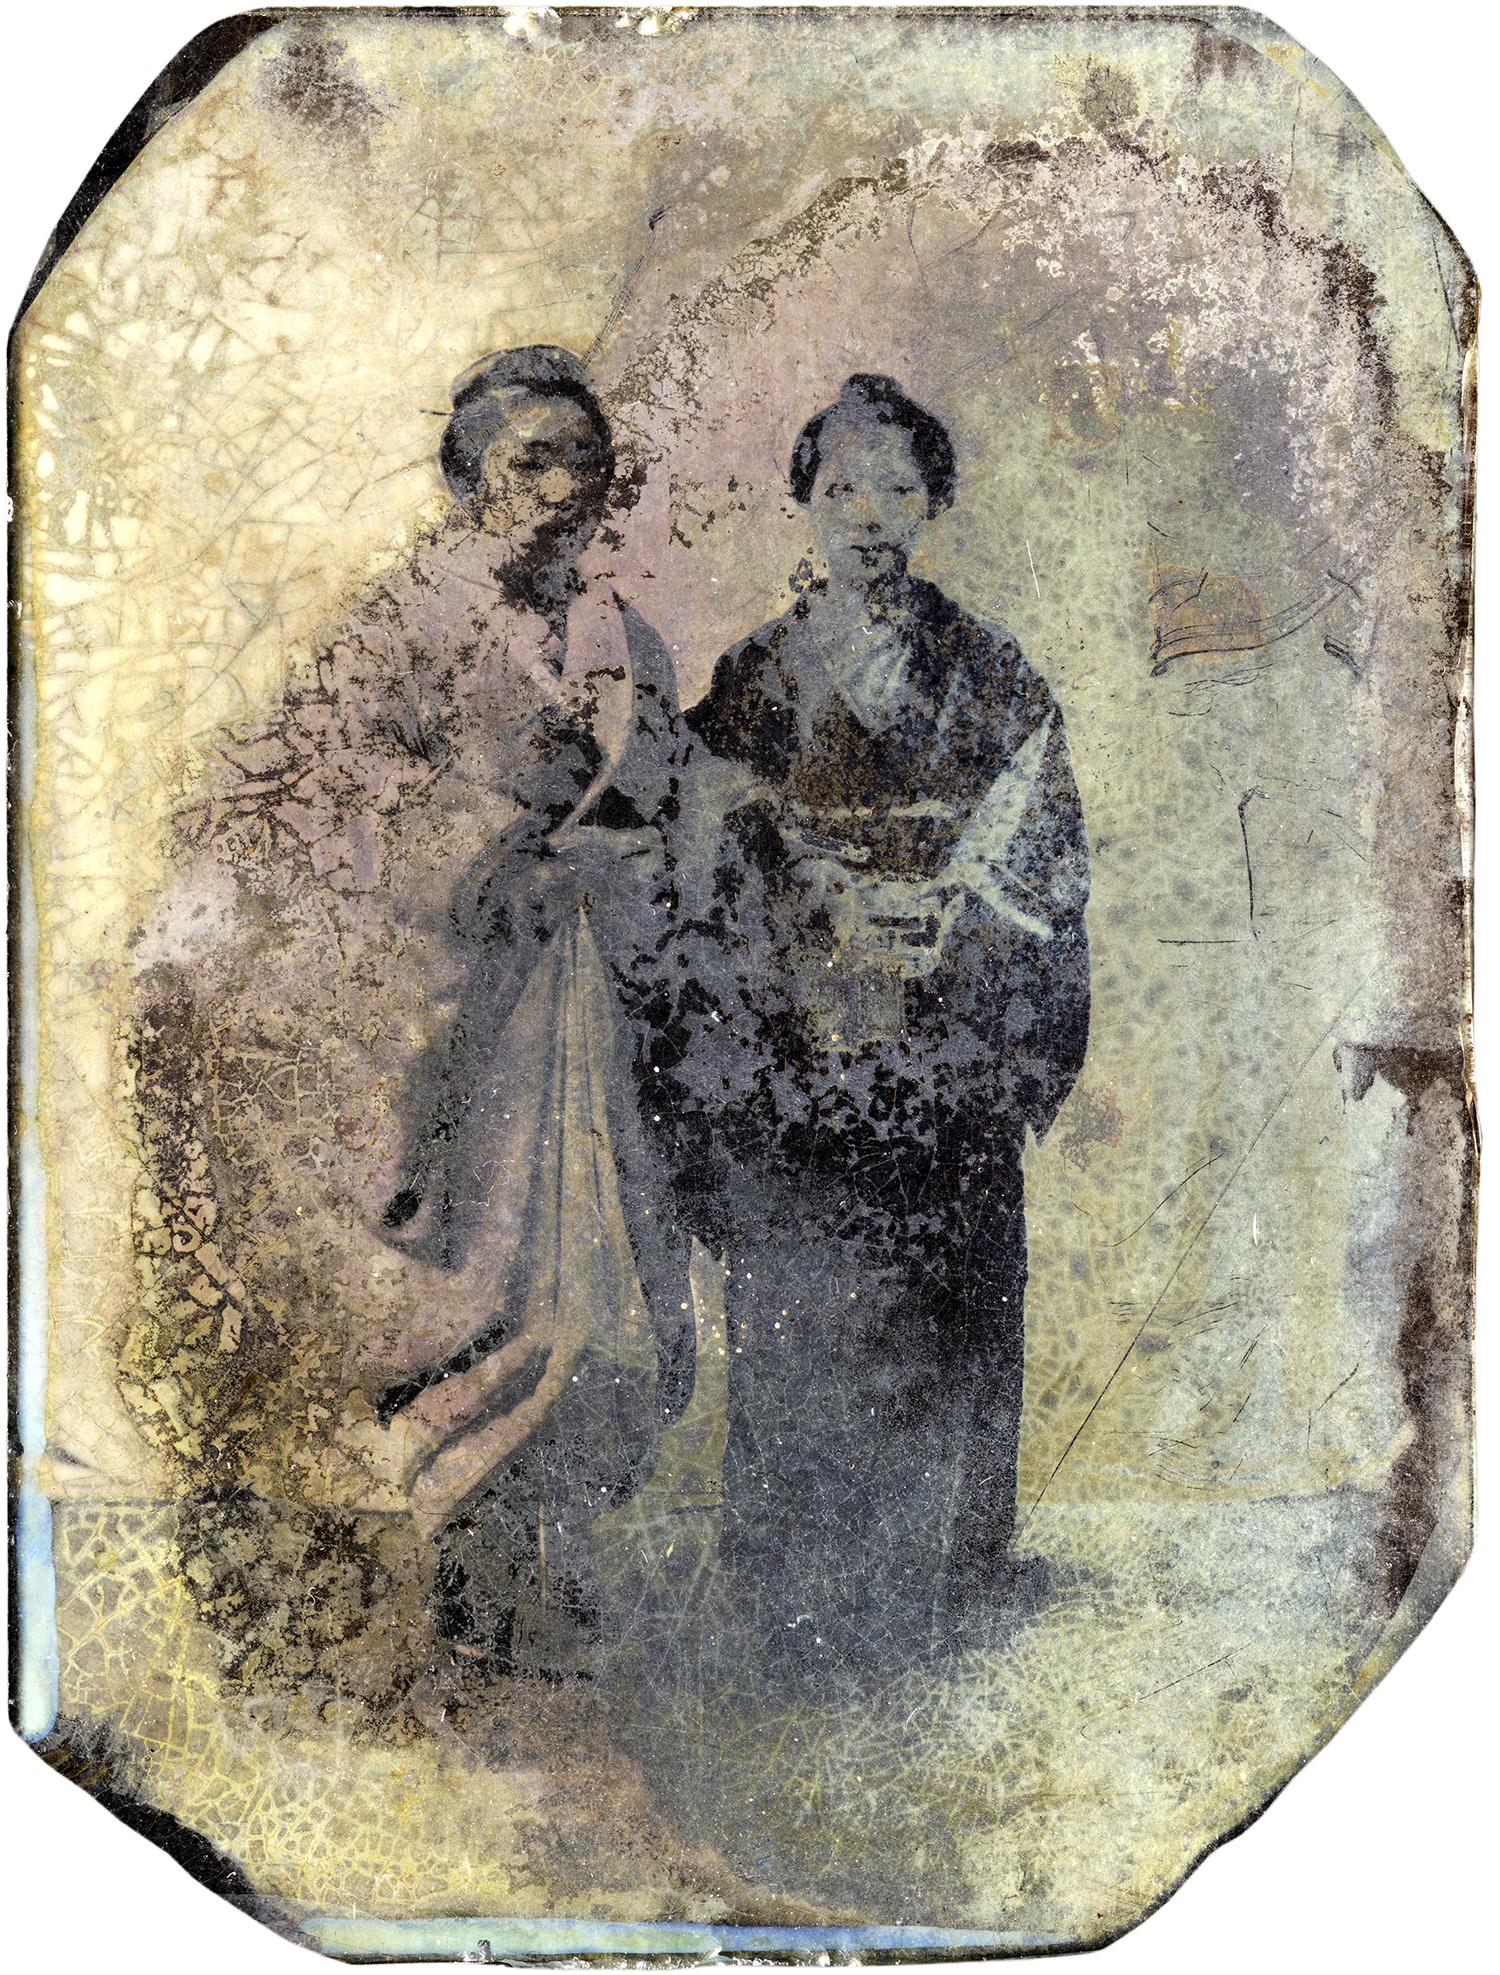 Two Japanese Women, 2012 - LR12052